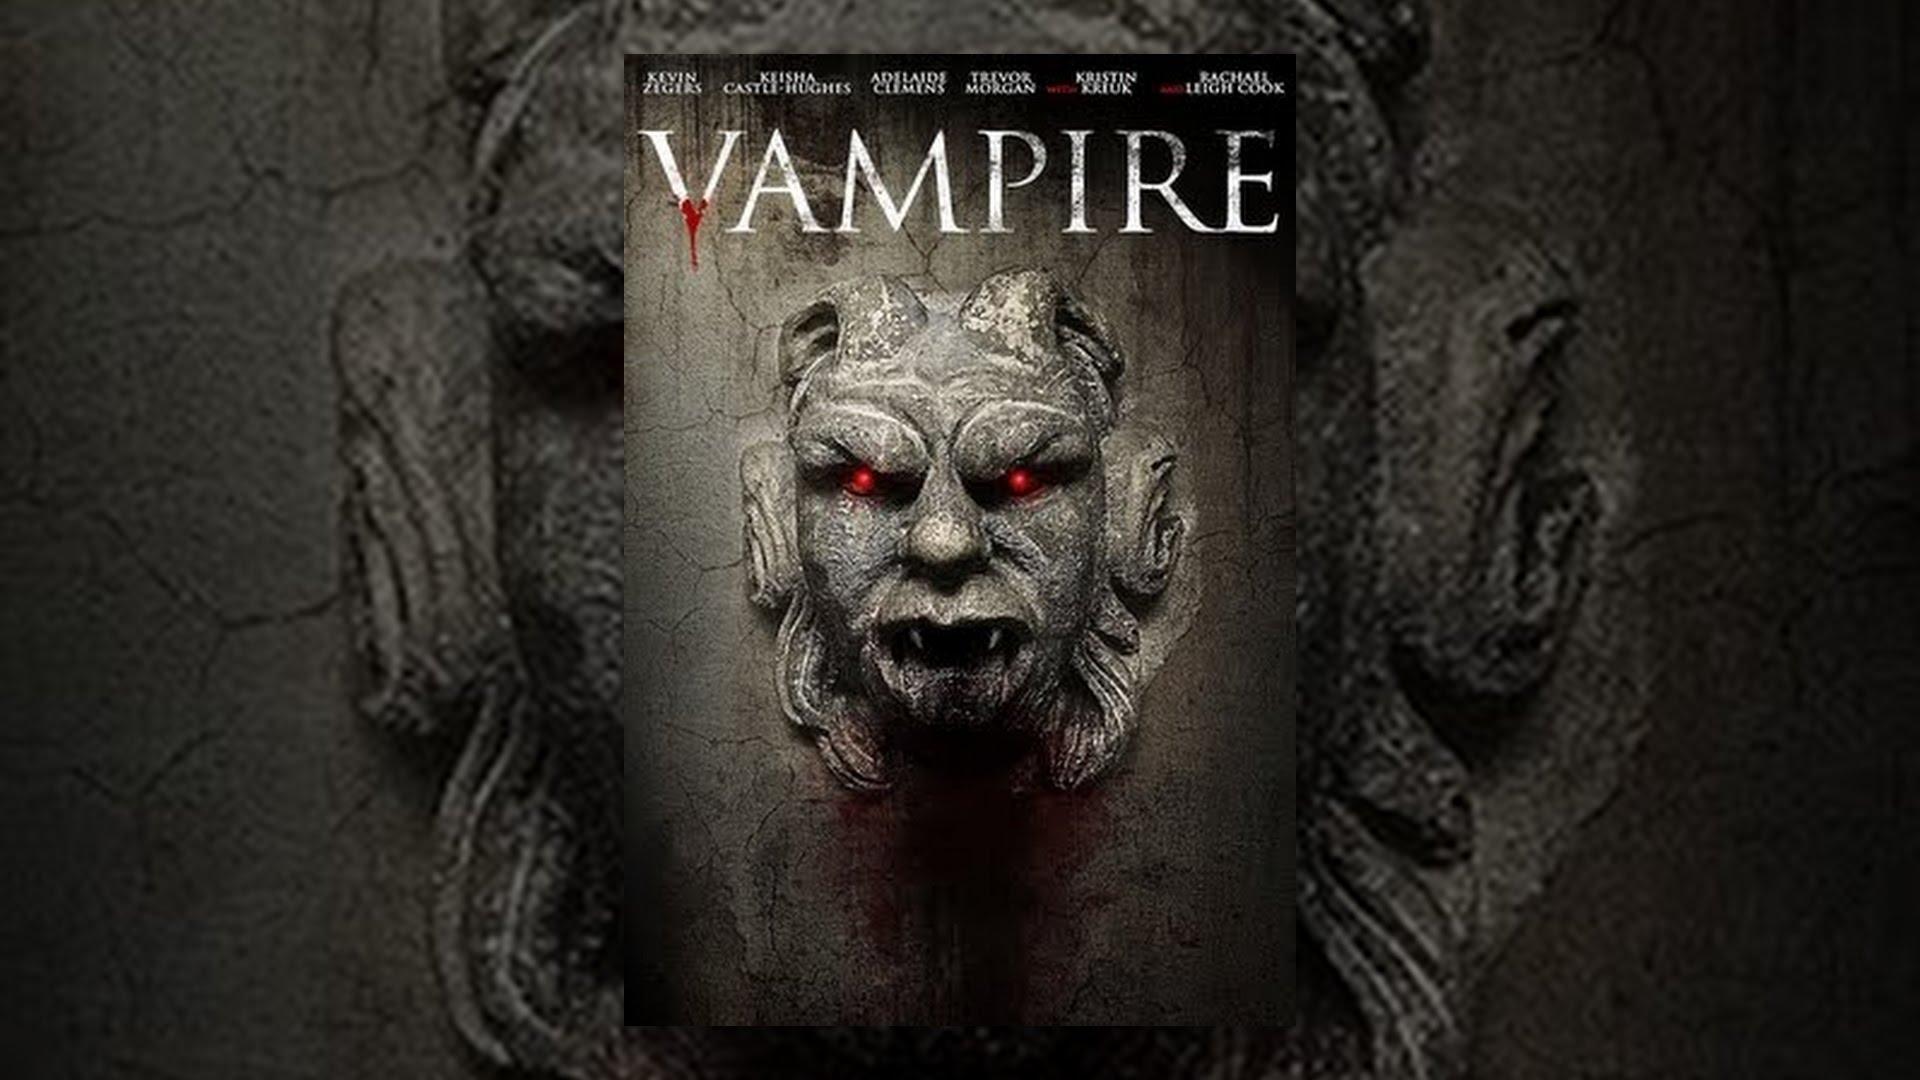 chat Vampire room fetish